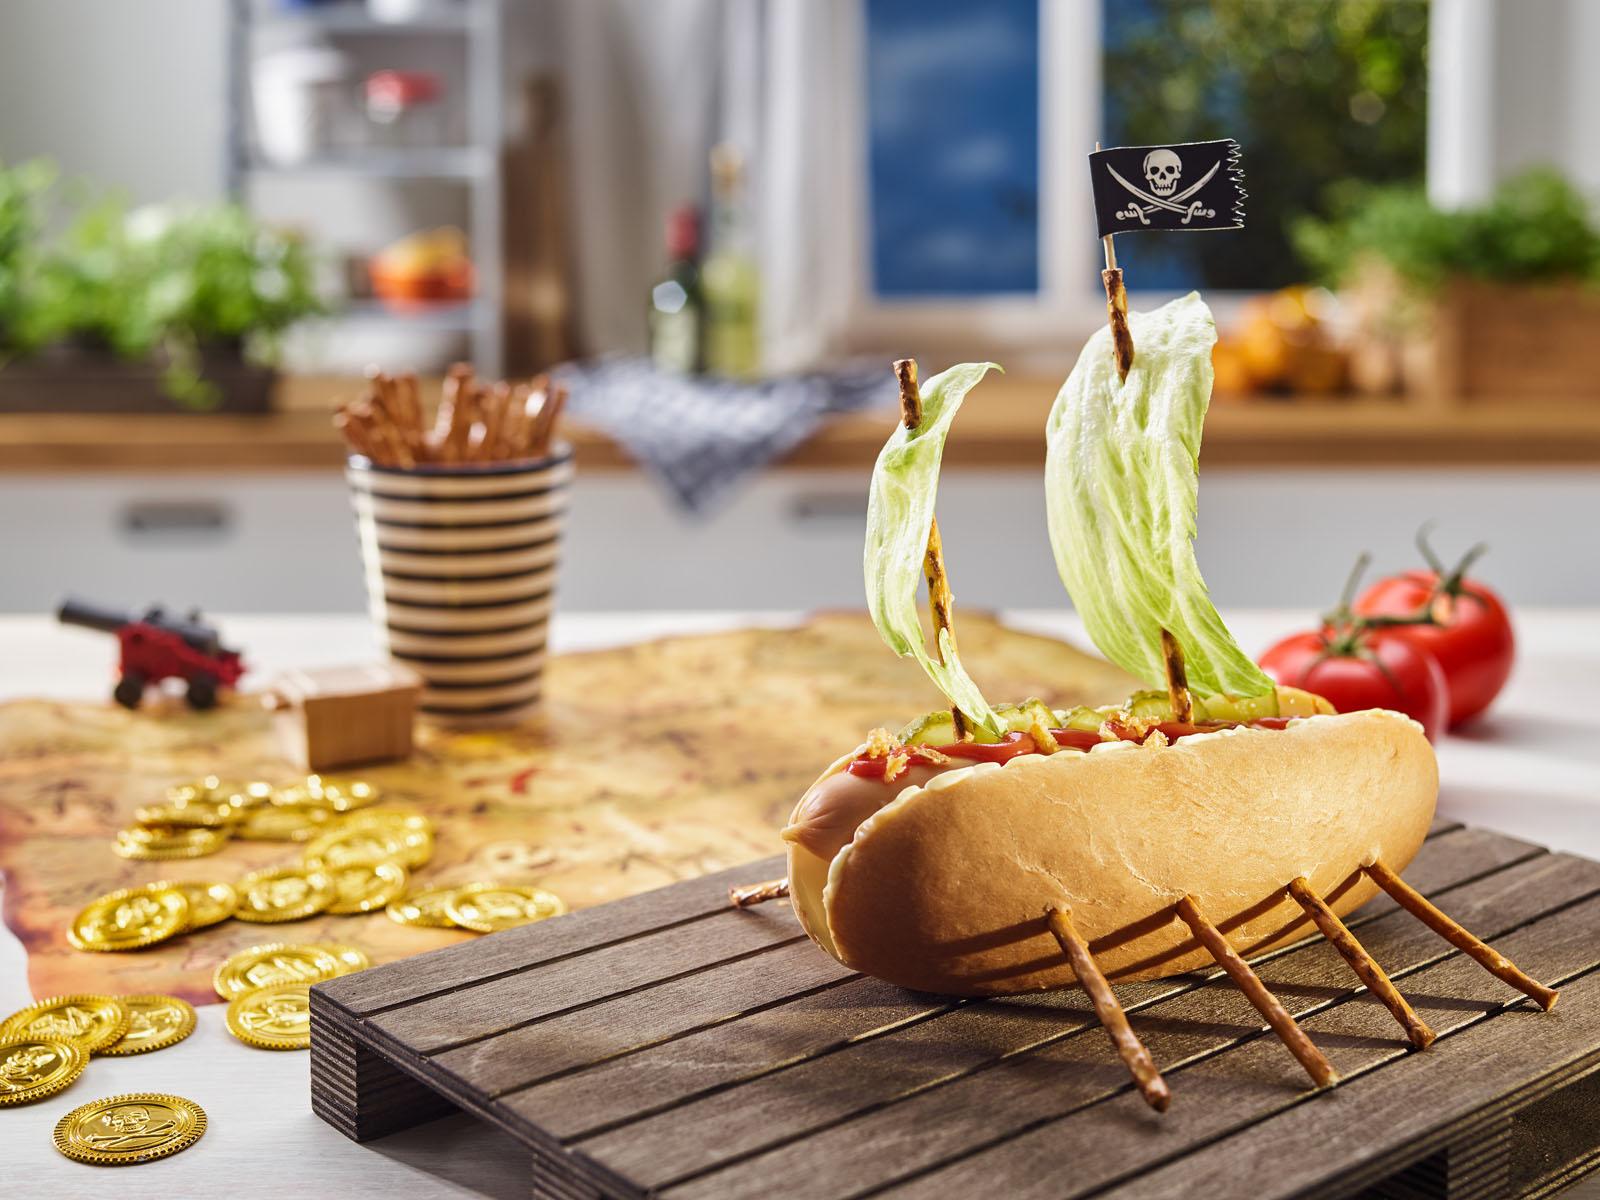 Leckeres Rezept für MILKANA Piratenschiff-Brot